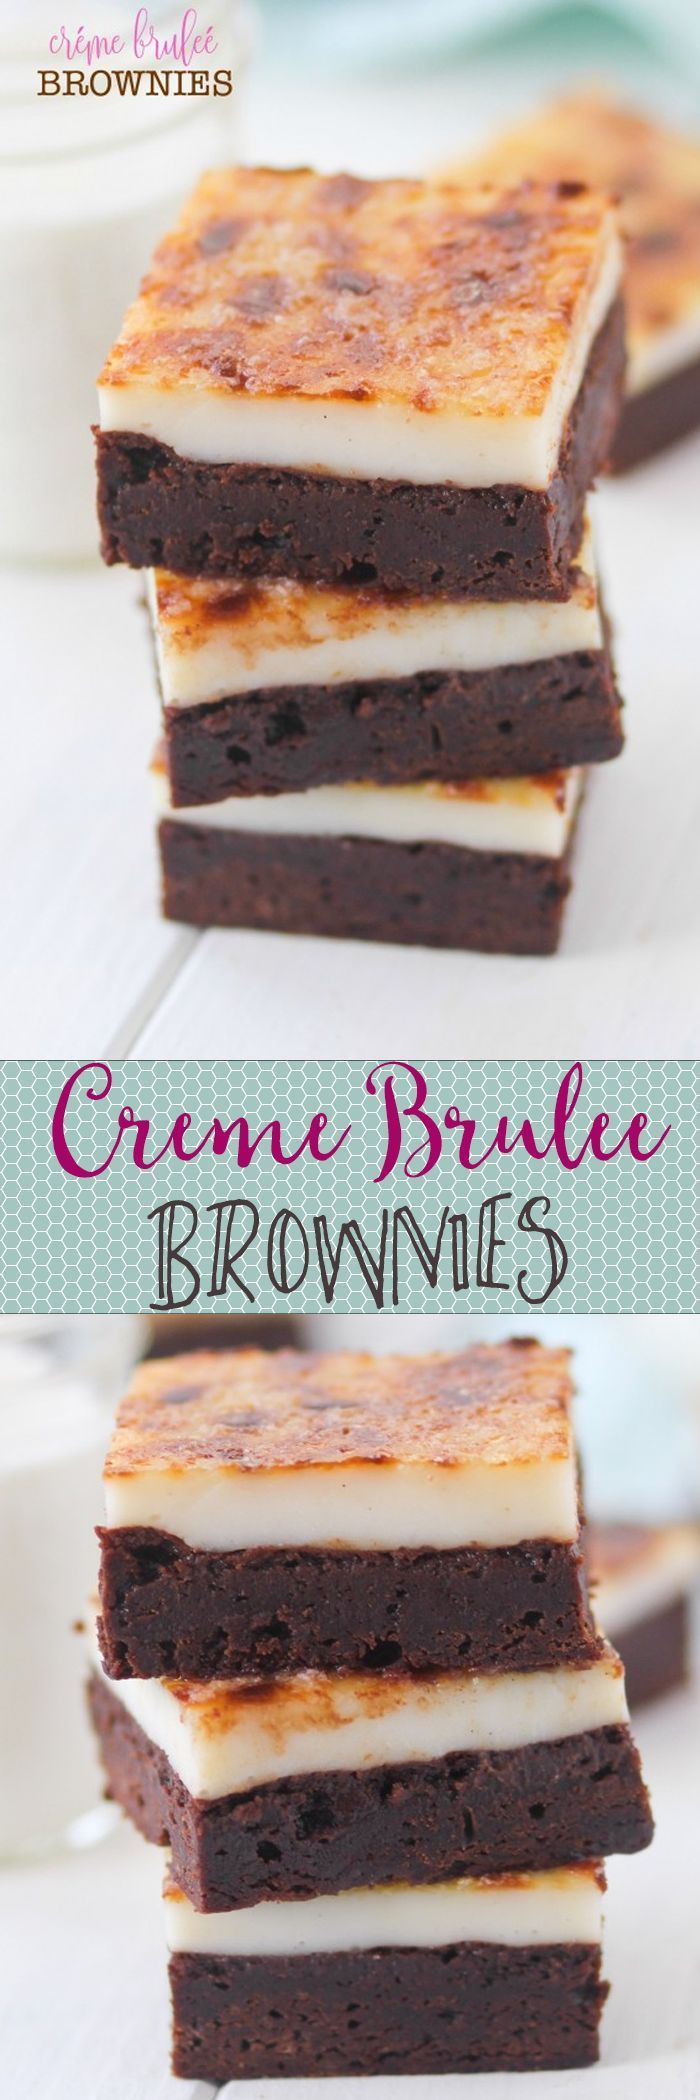 creme brulee brownies two of my favorite desserts in. Black Bedroom Furniture Sets. Home Design Ideas